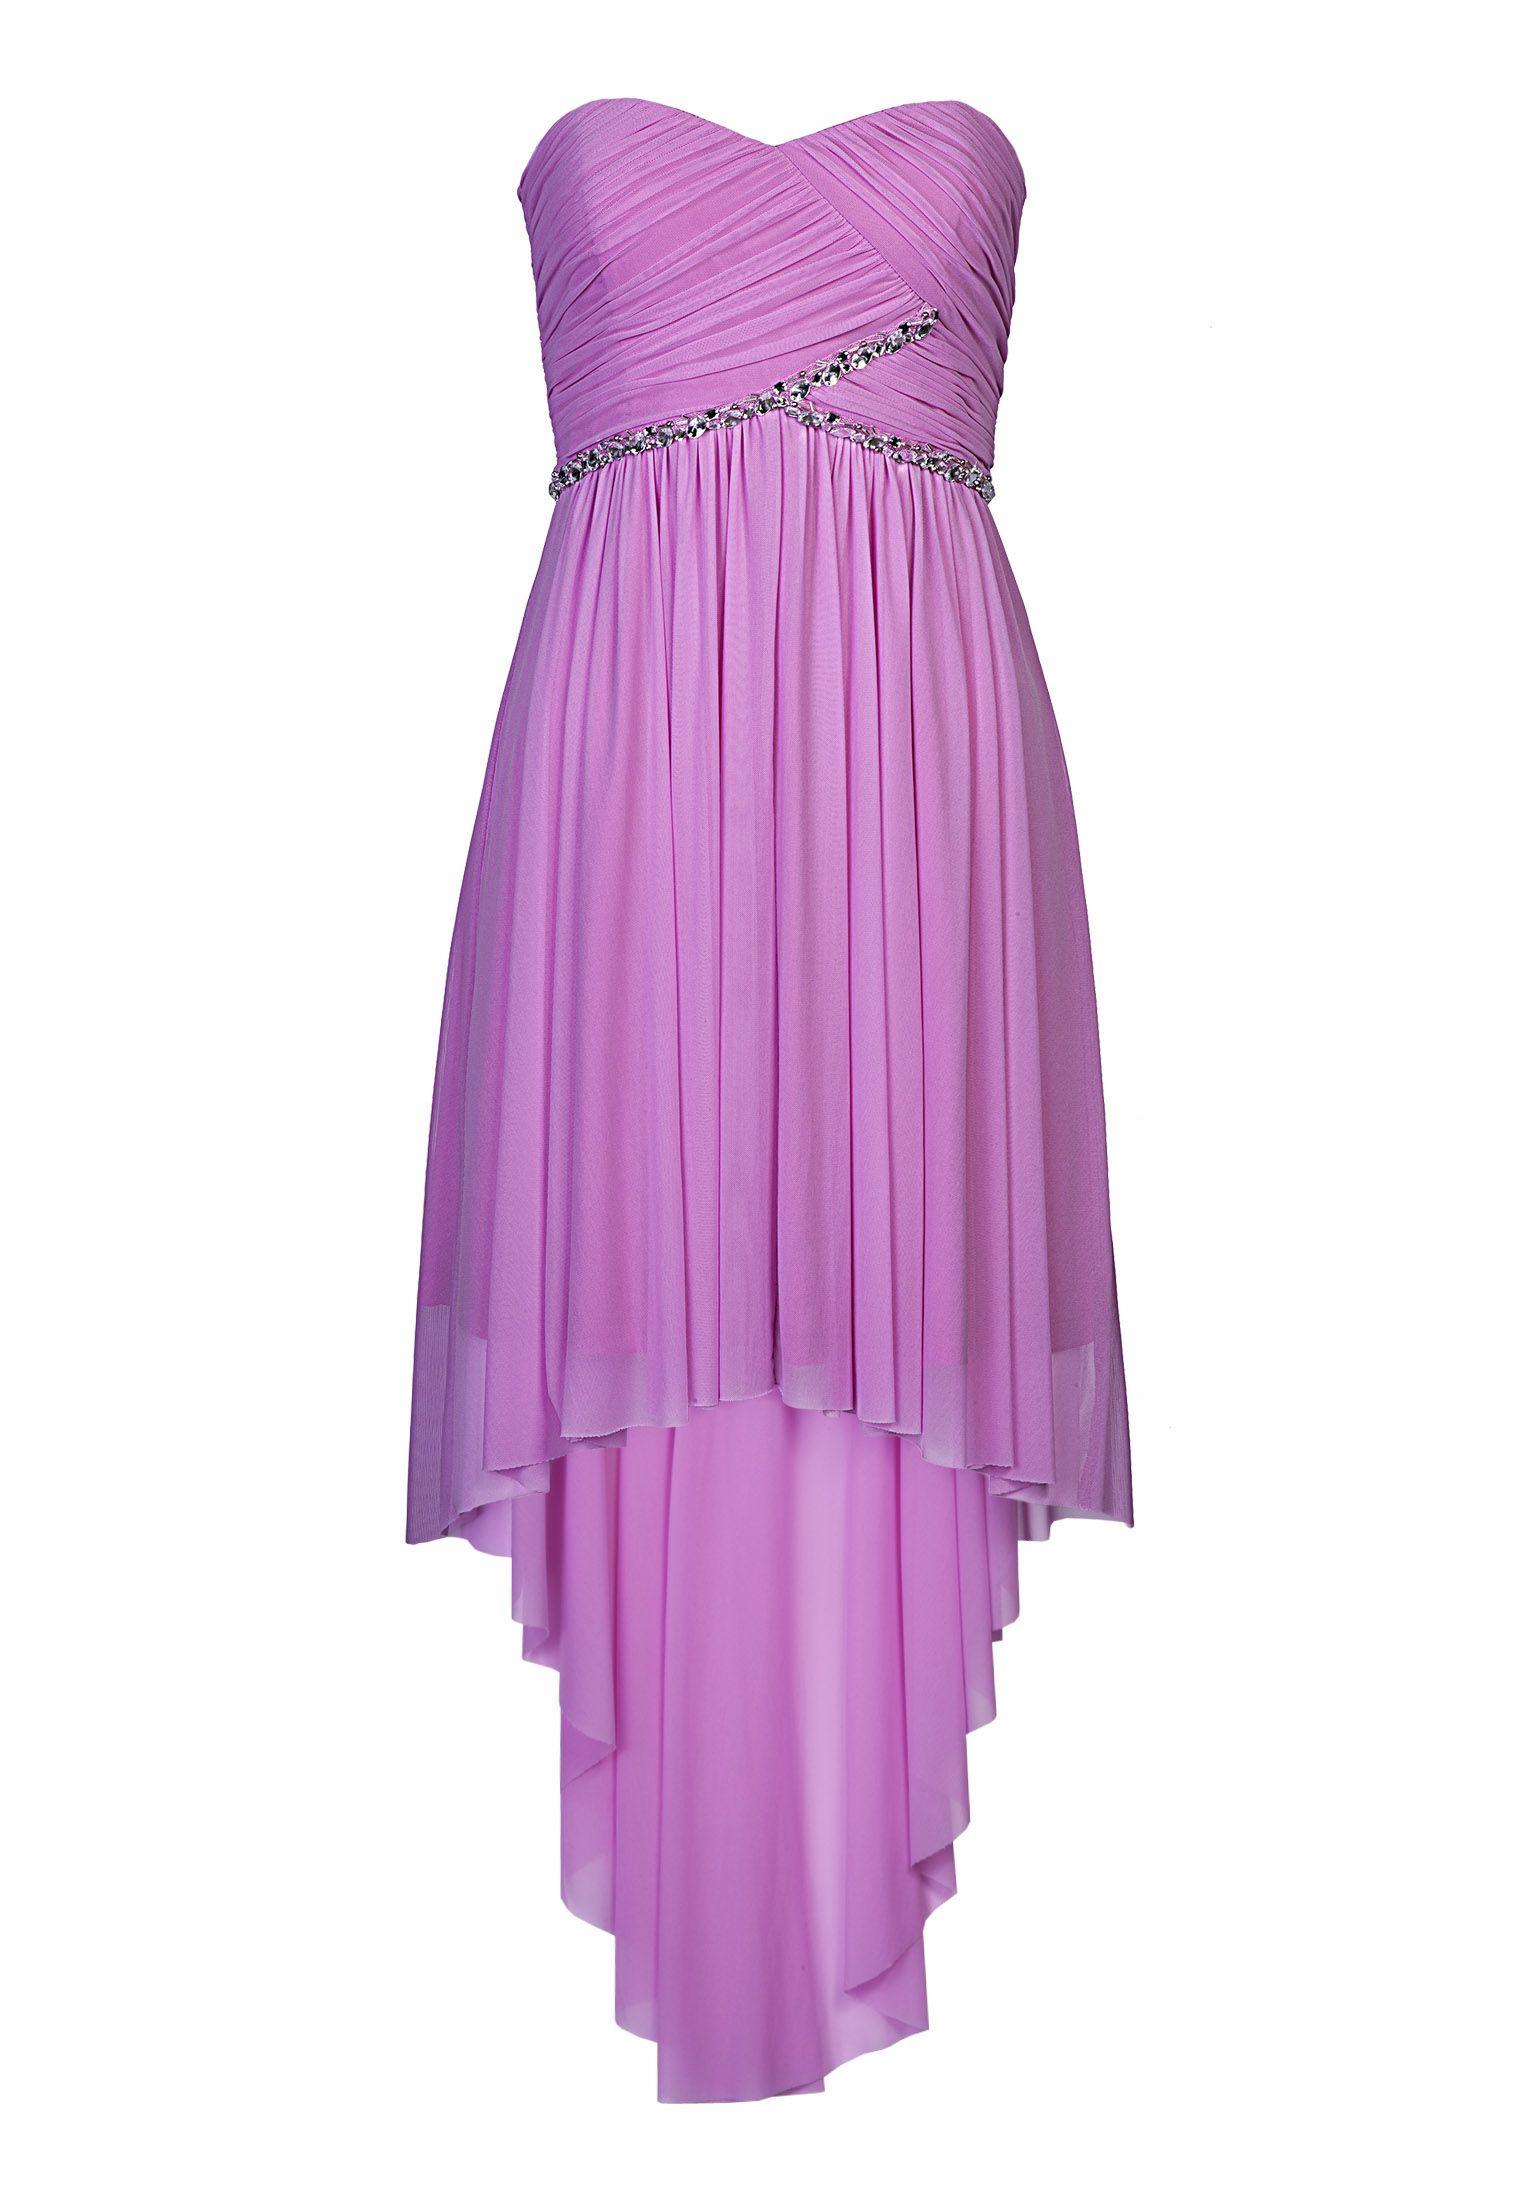 17 Cool Kleid Flieder Lang Boutique15 Schön Kleid Flieder Lang Galerie